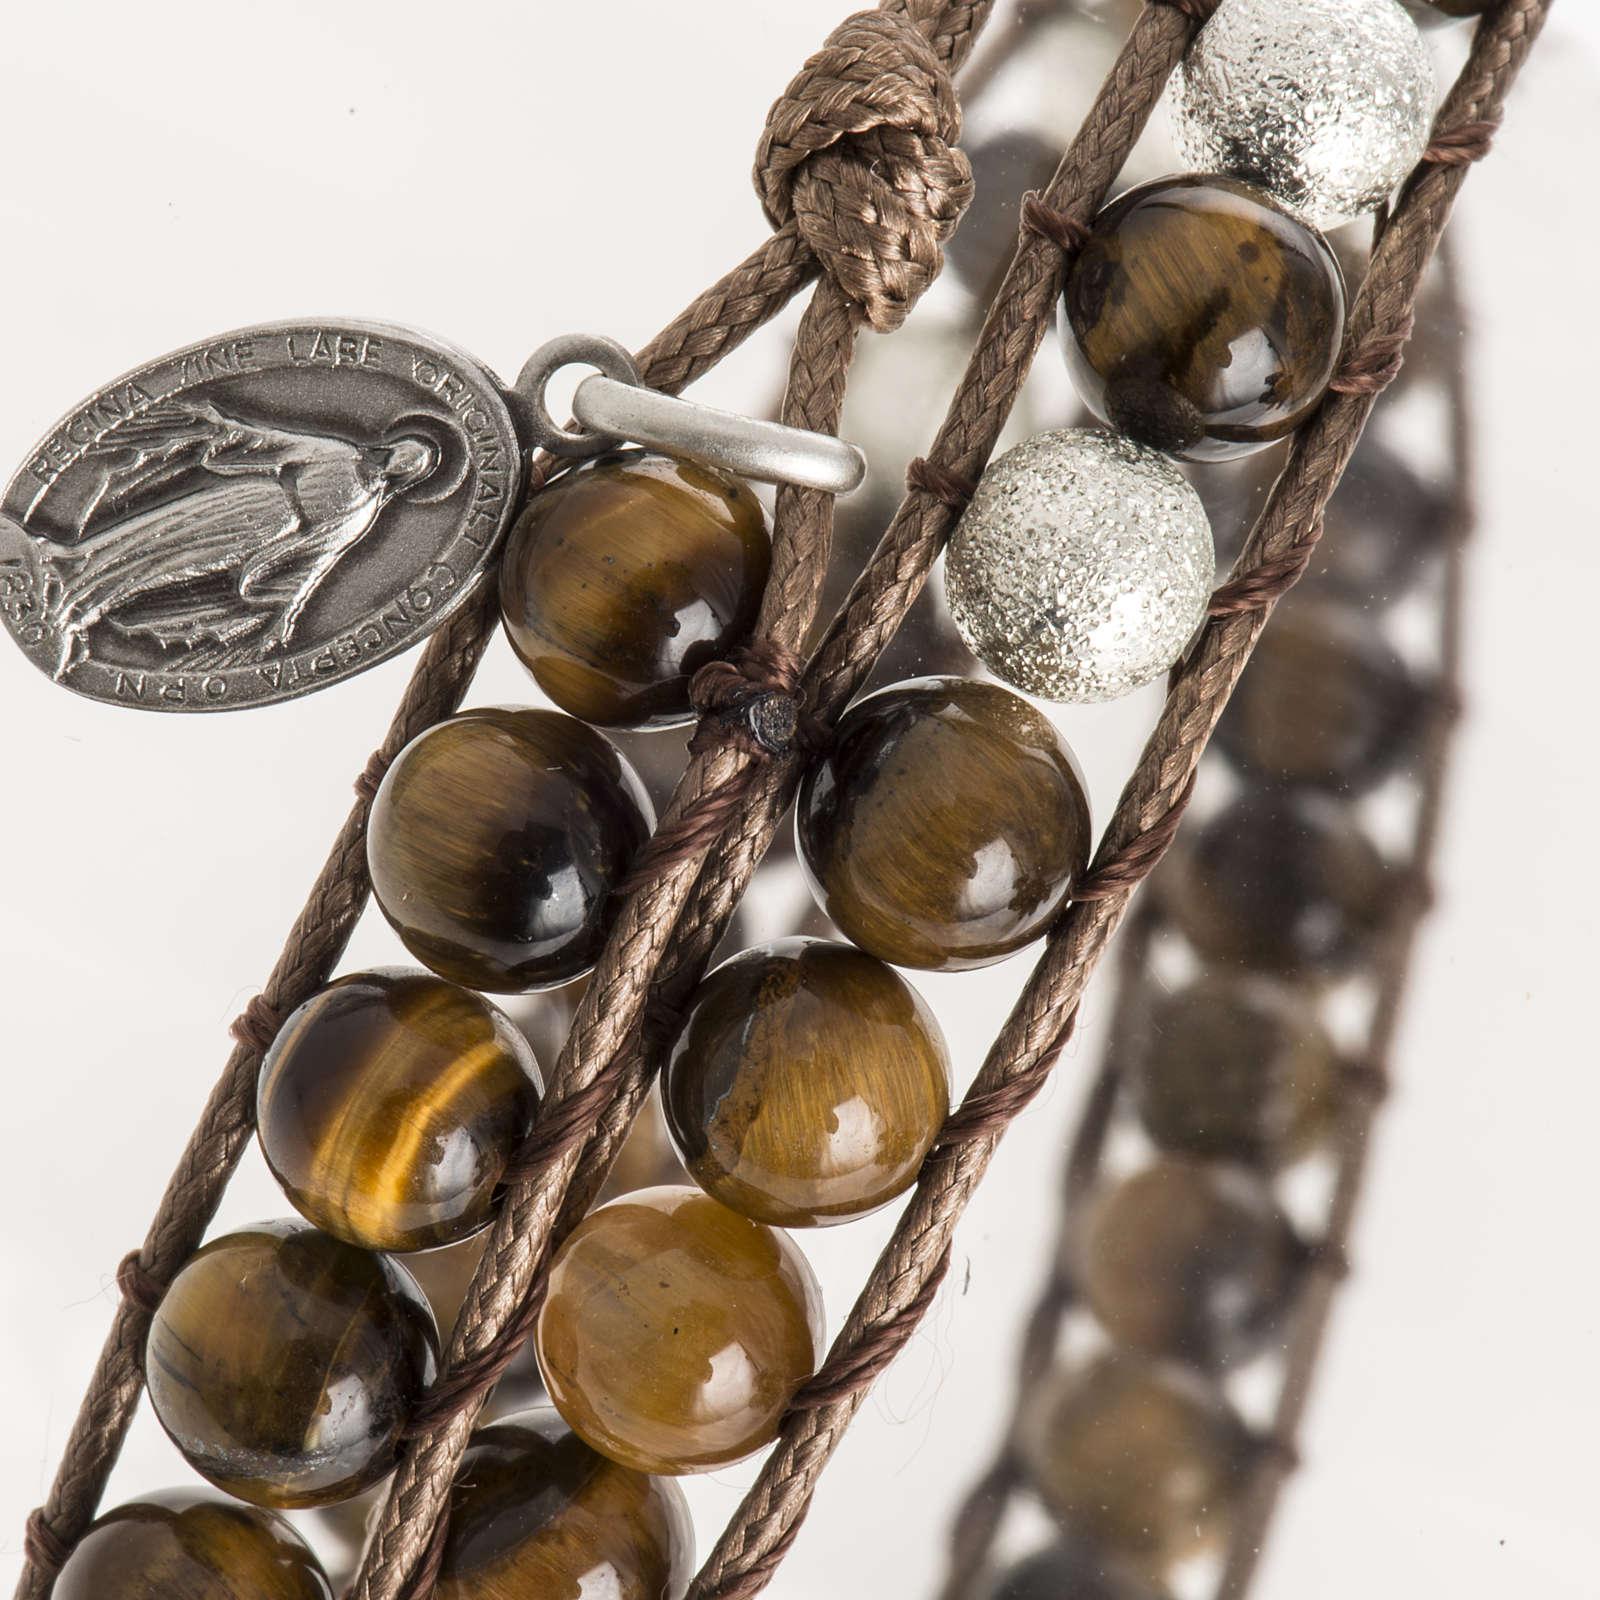 Tiger's eye bracelet 6mm 4